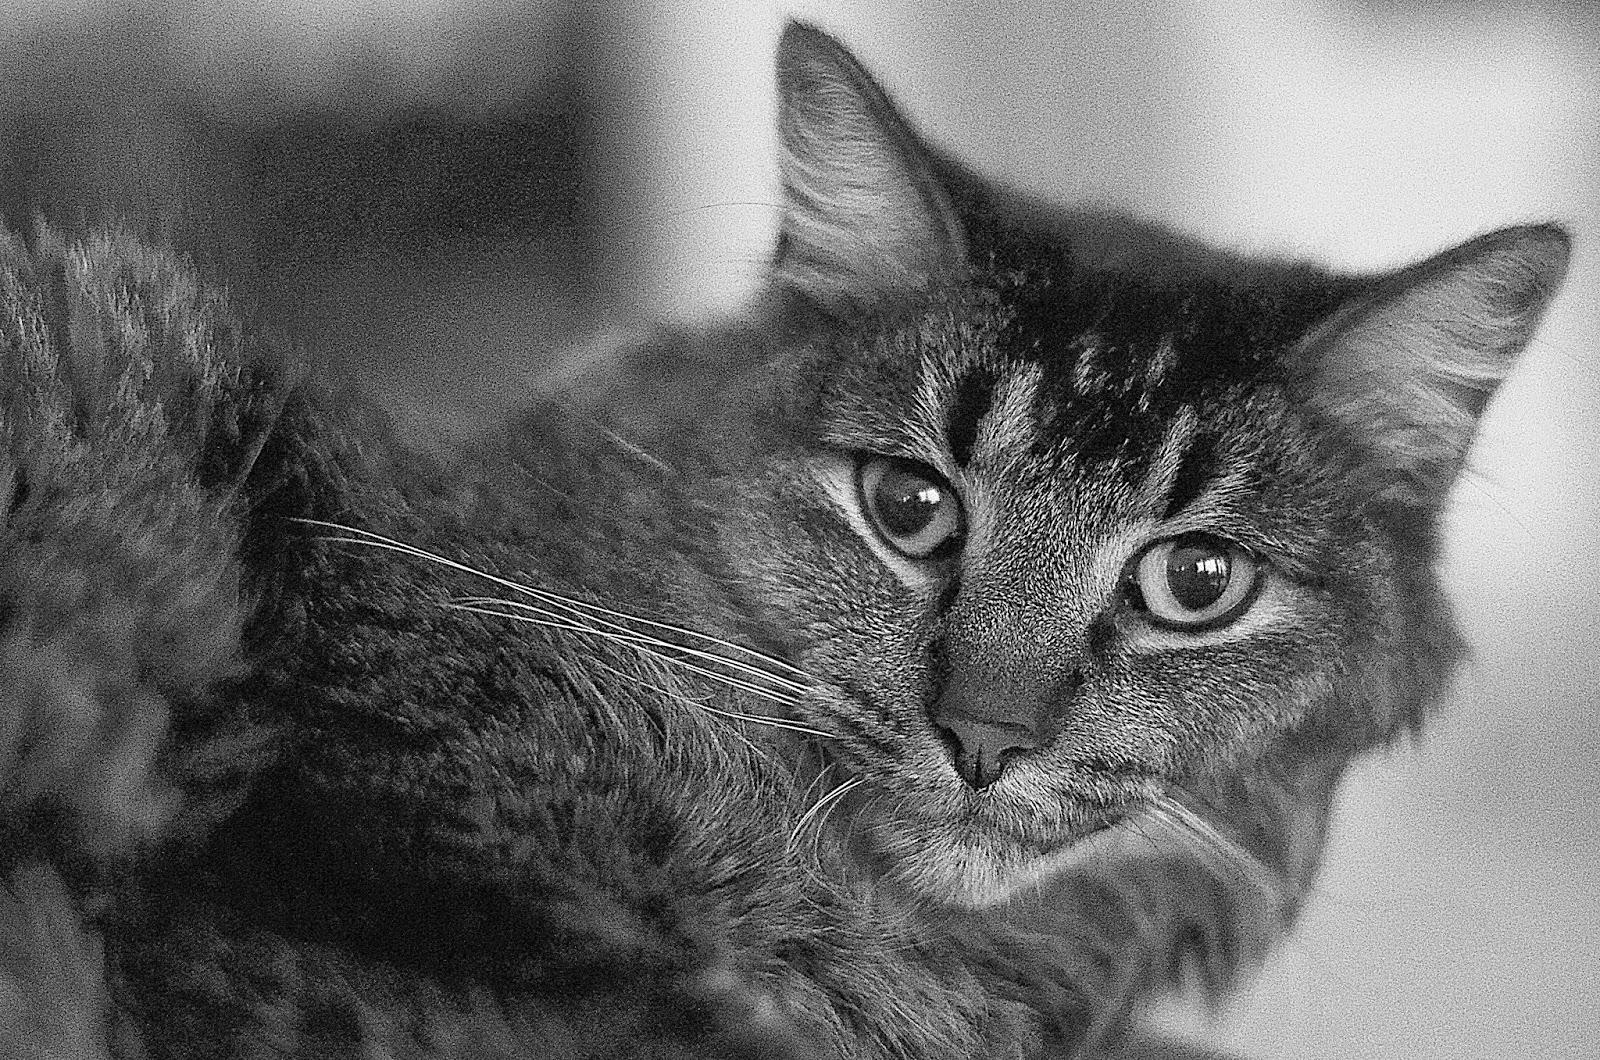 cat black and white photograph, katt, fotograf, photographer, close up, djur, husdjur, närbild, svartvit, svartvitt